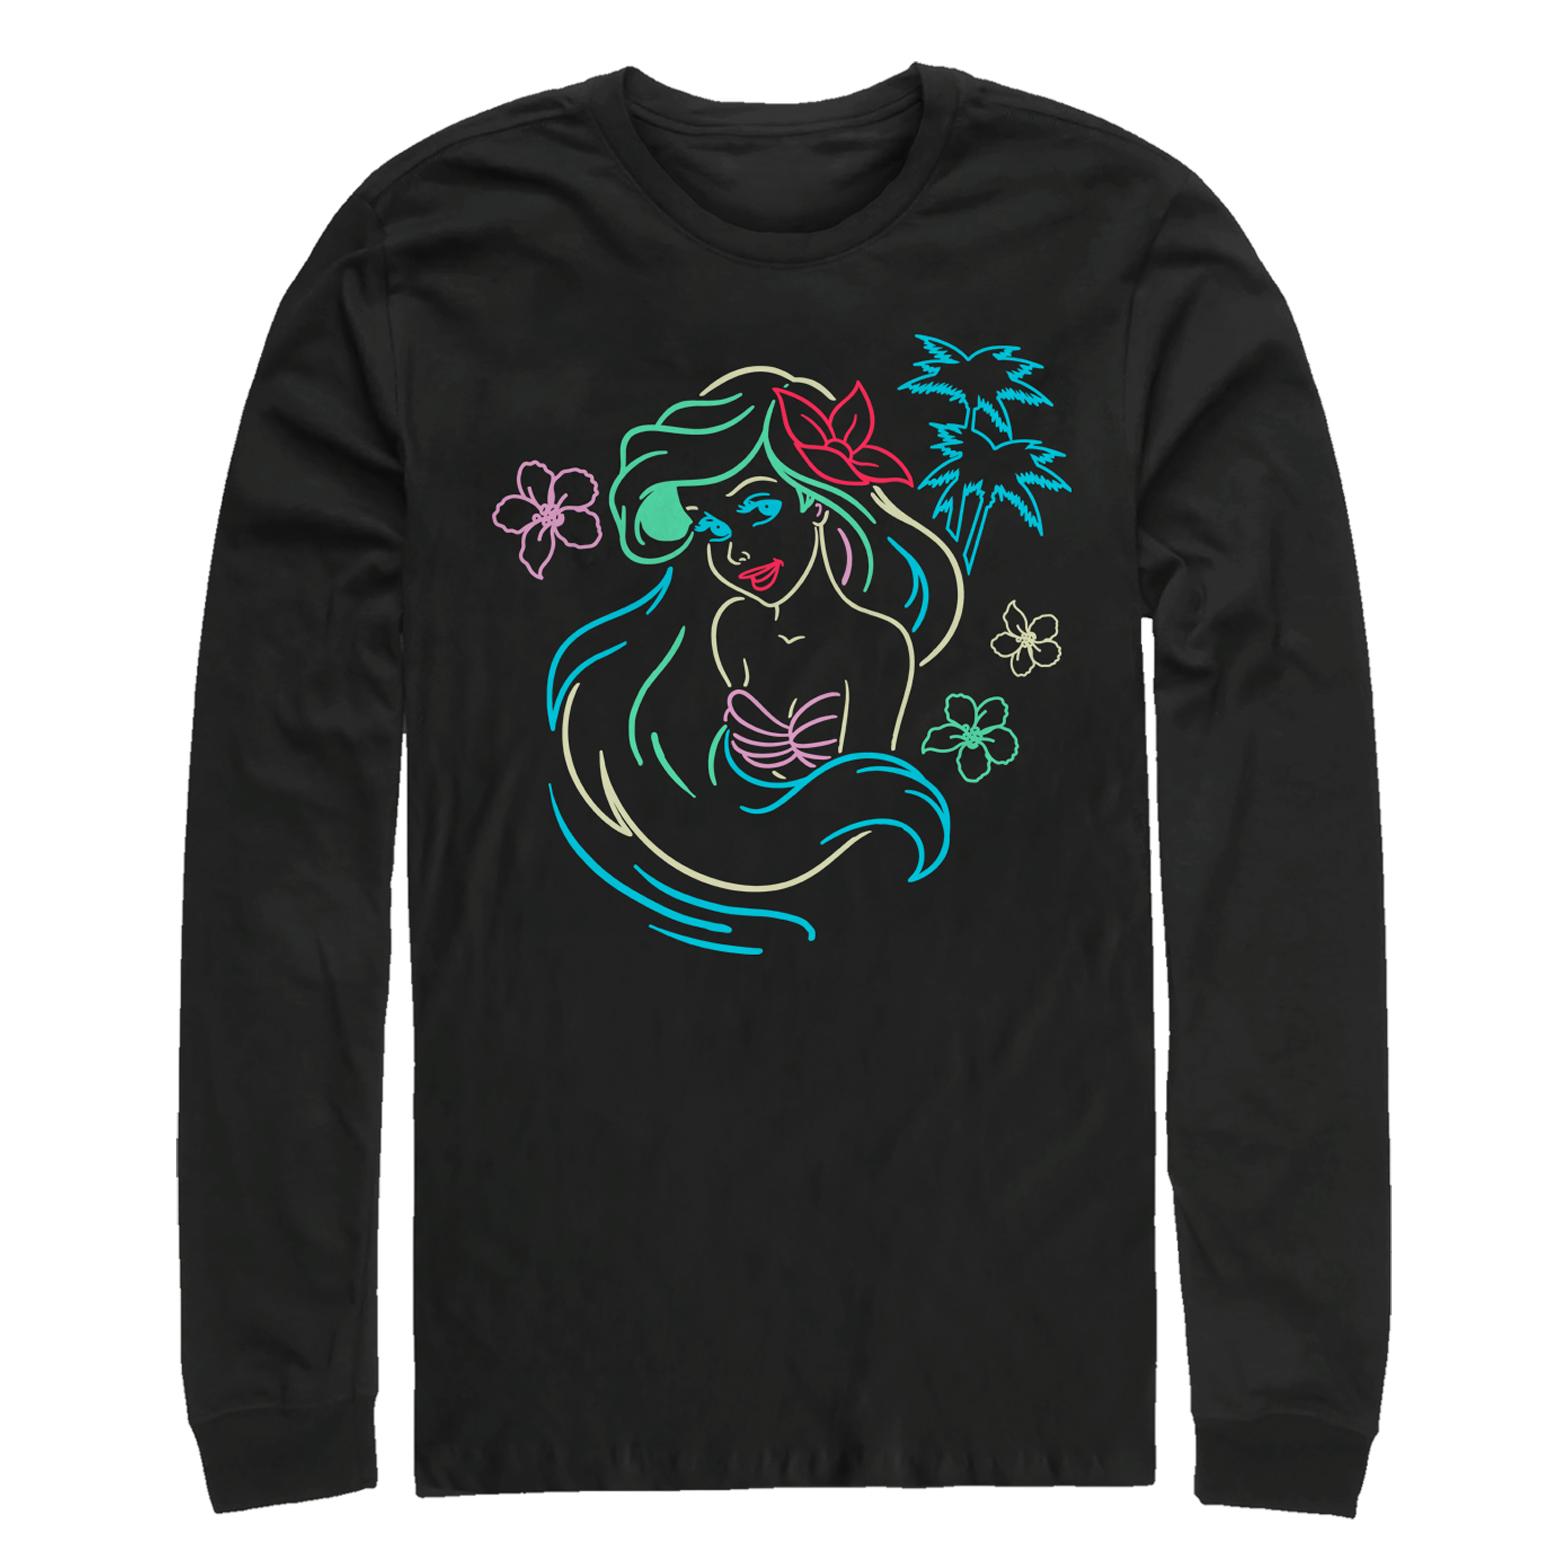 The Little Mermaid Men's Ariel Neon Light Print Long Sleeve T-Shirt